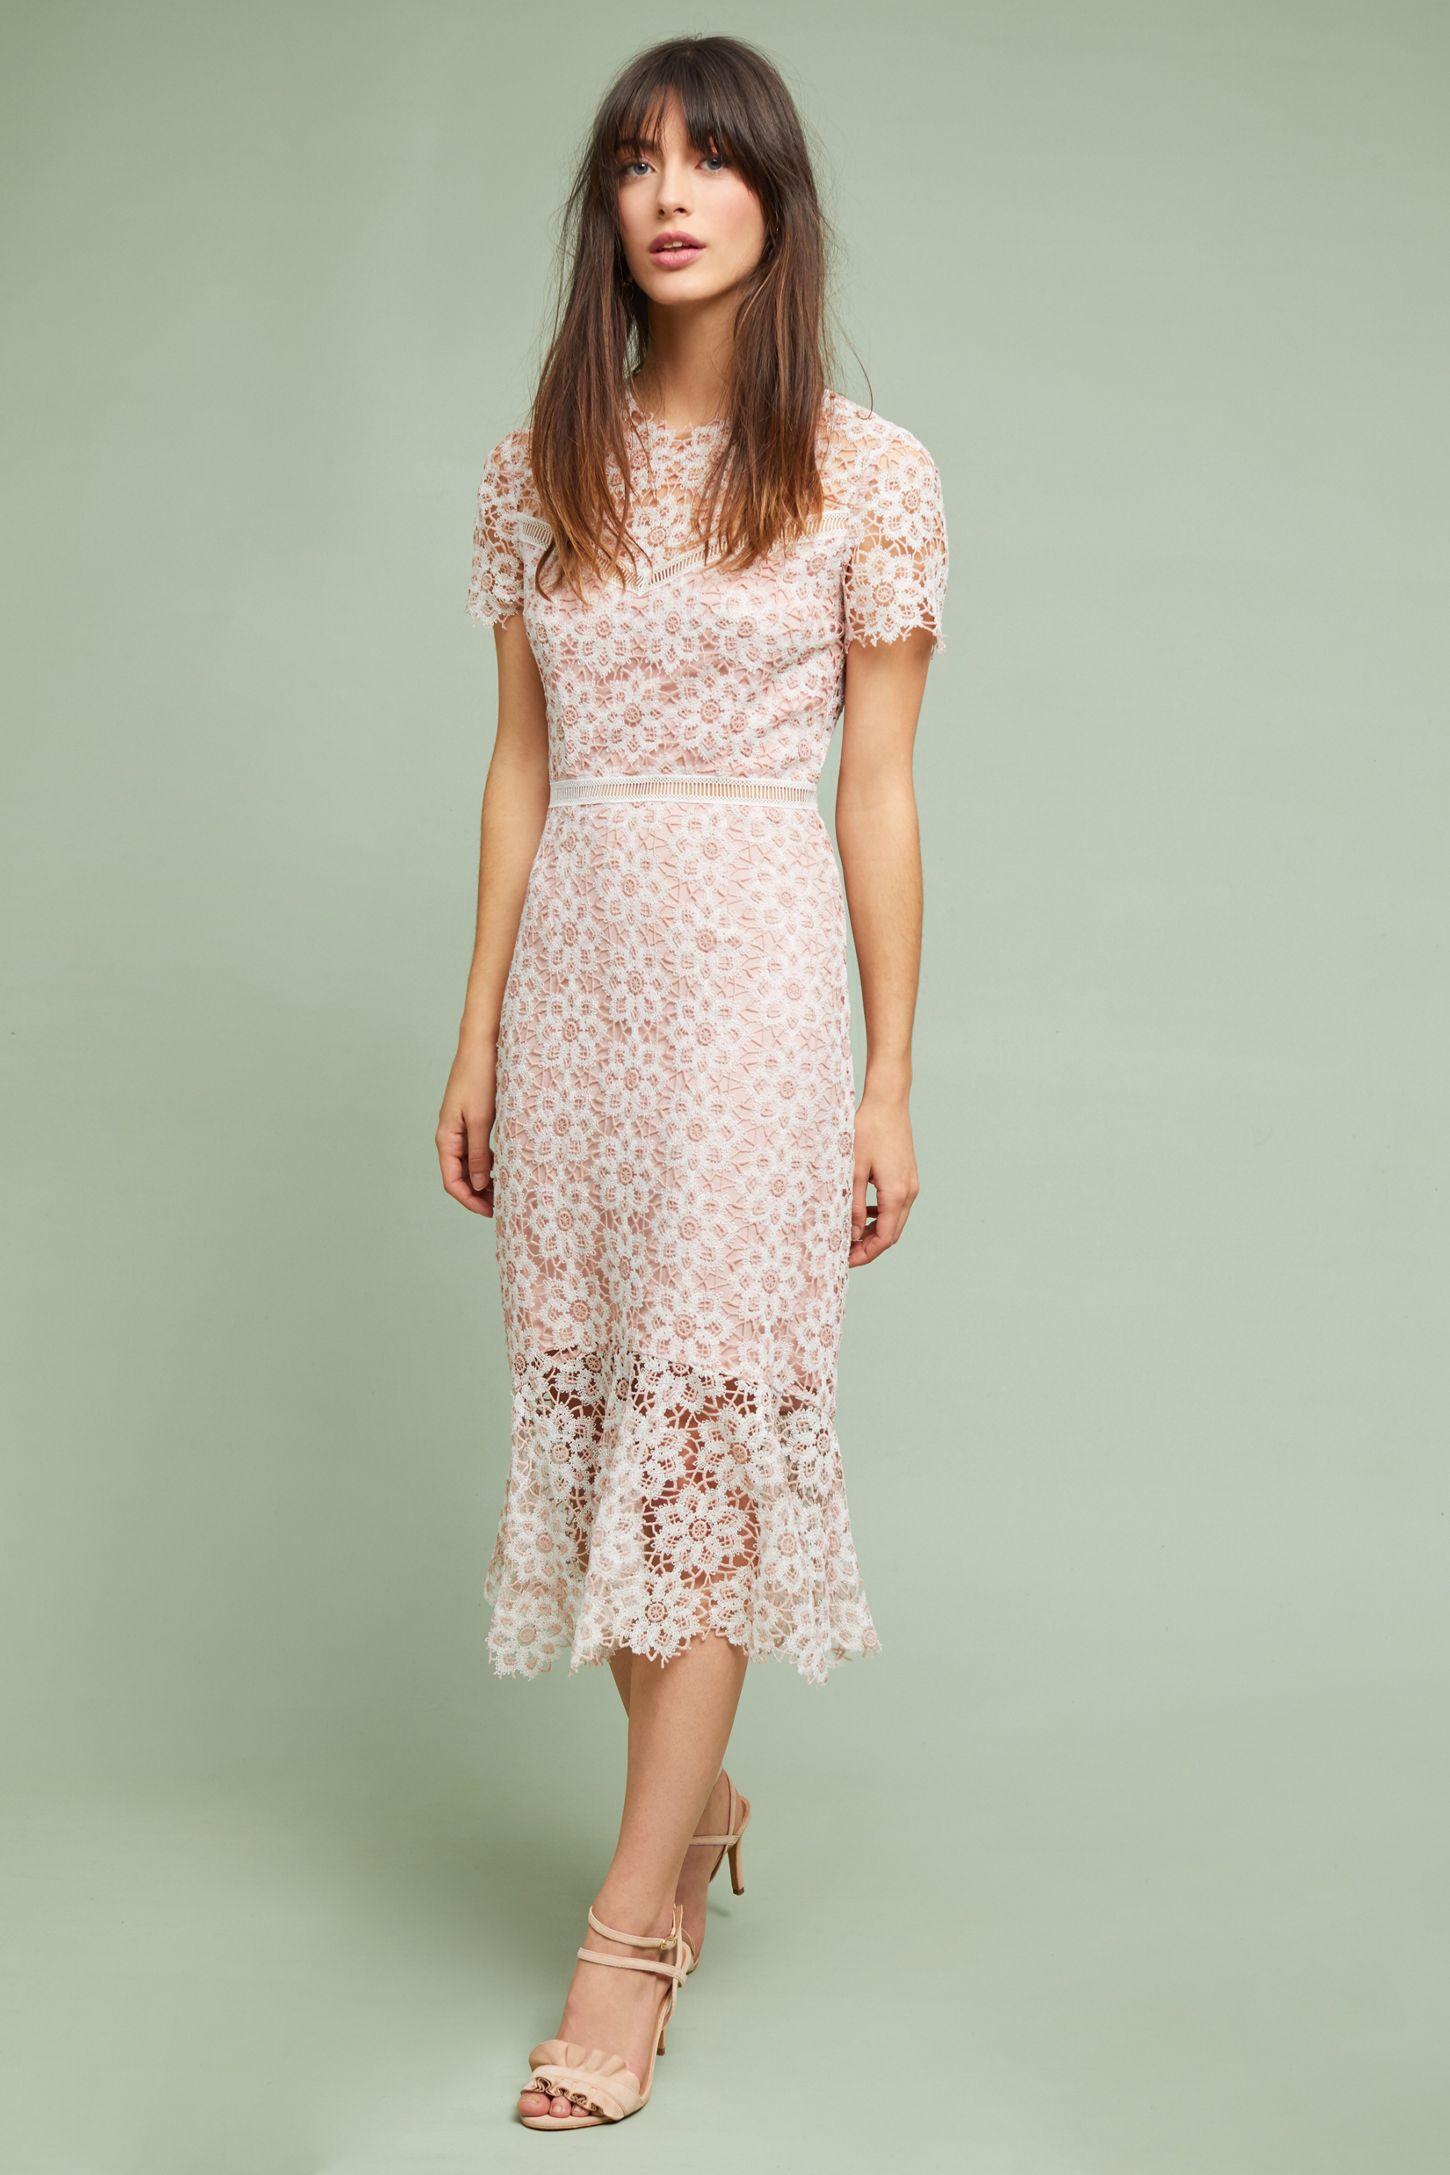 578441d202f4 Ambrosina Lace Dress   Anthropologie